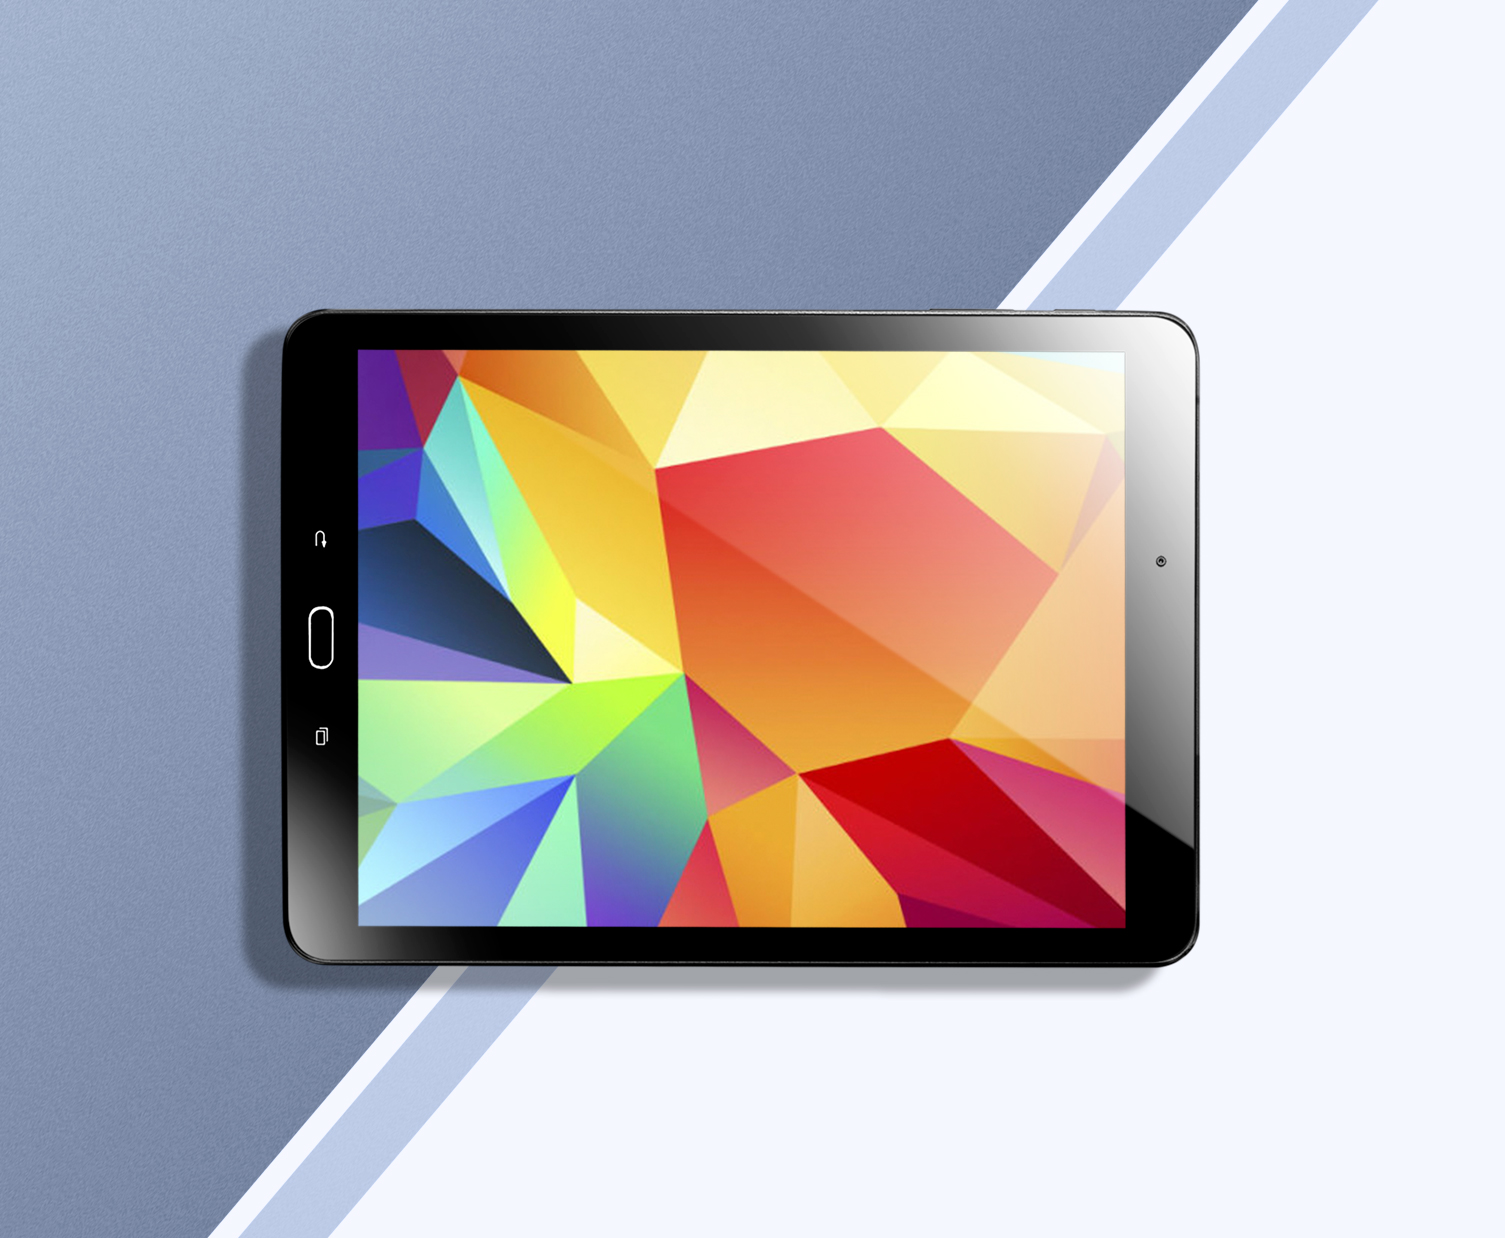 Tablet-Horizonal-Overhead-v2.jpeg